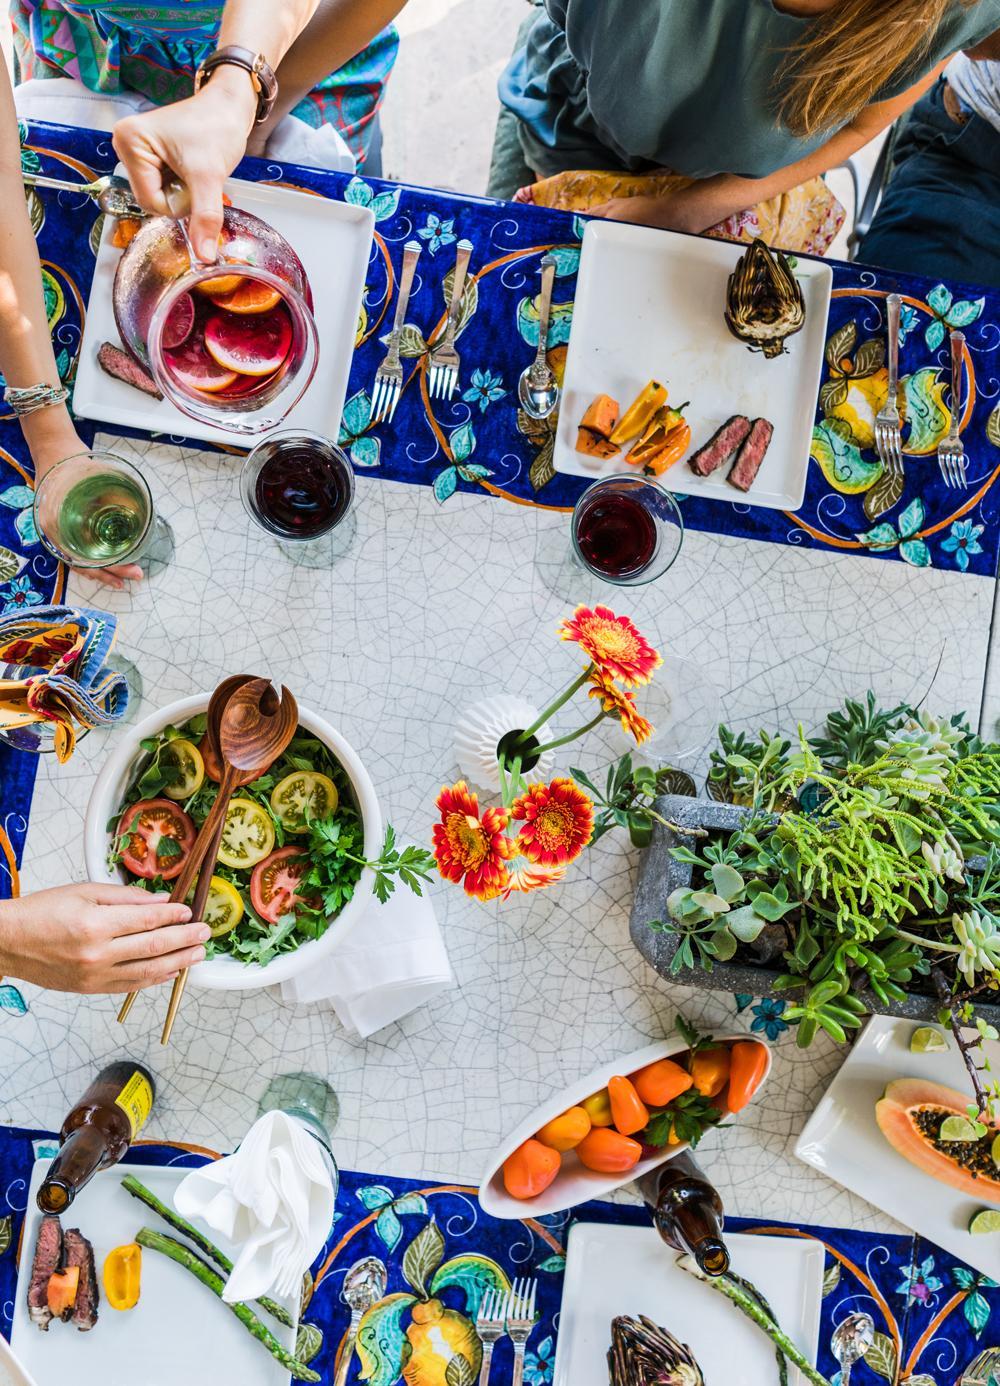 Backyard BBQ - Class Photos - image 11 - student project